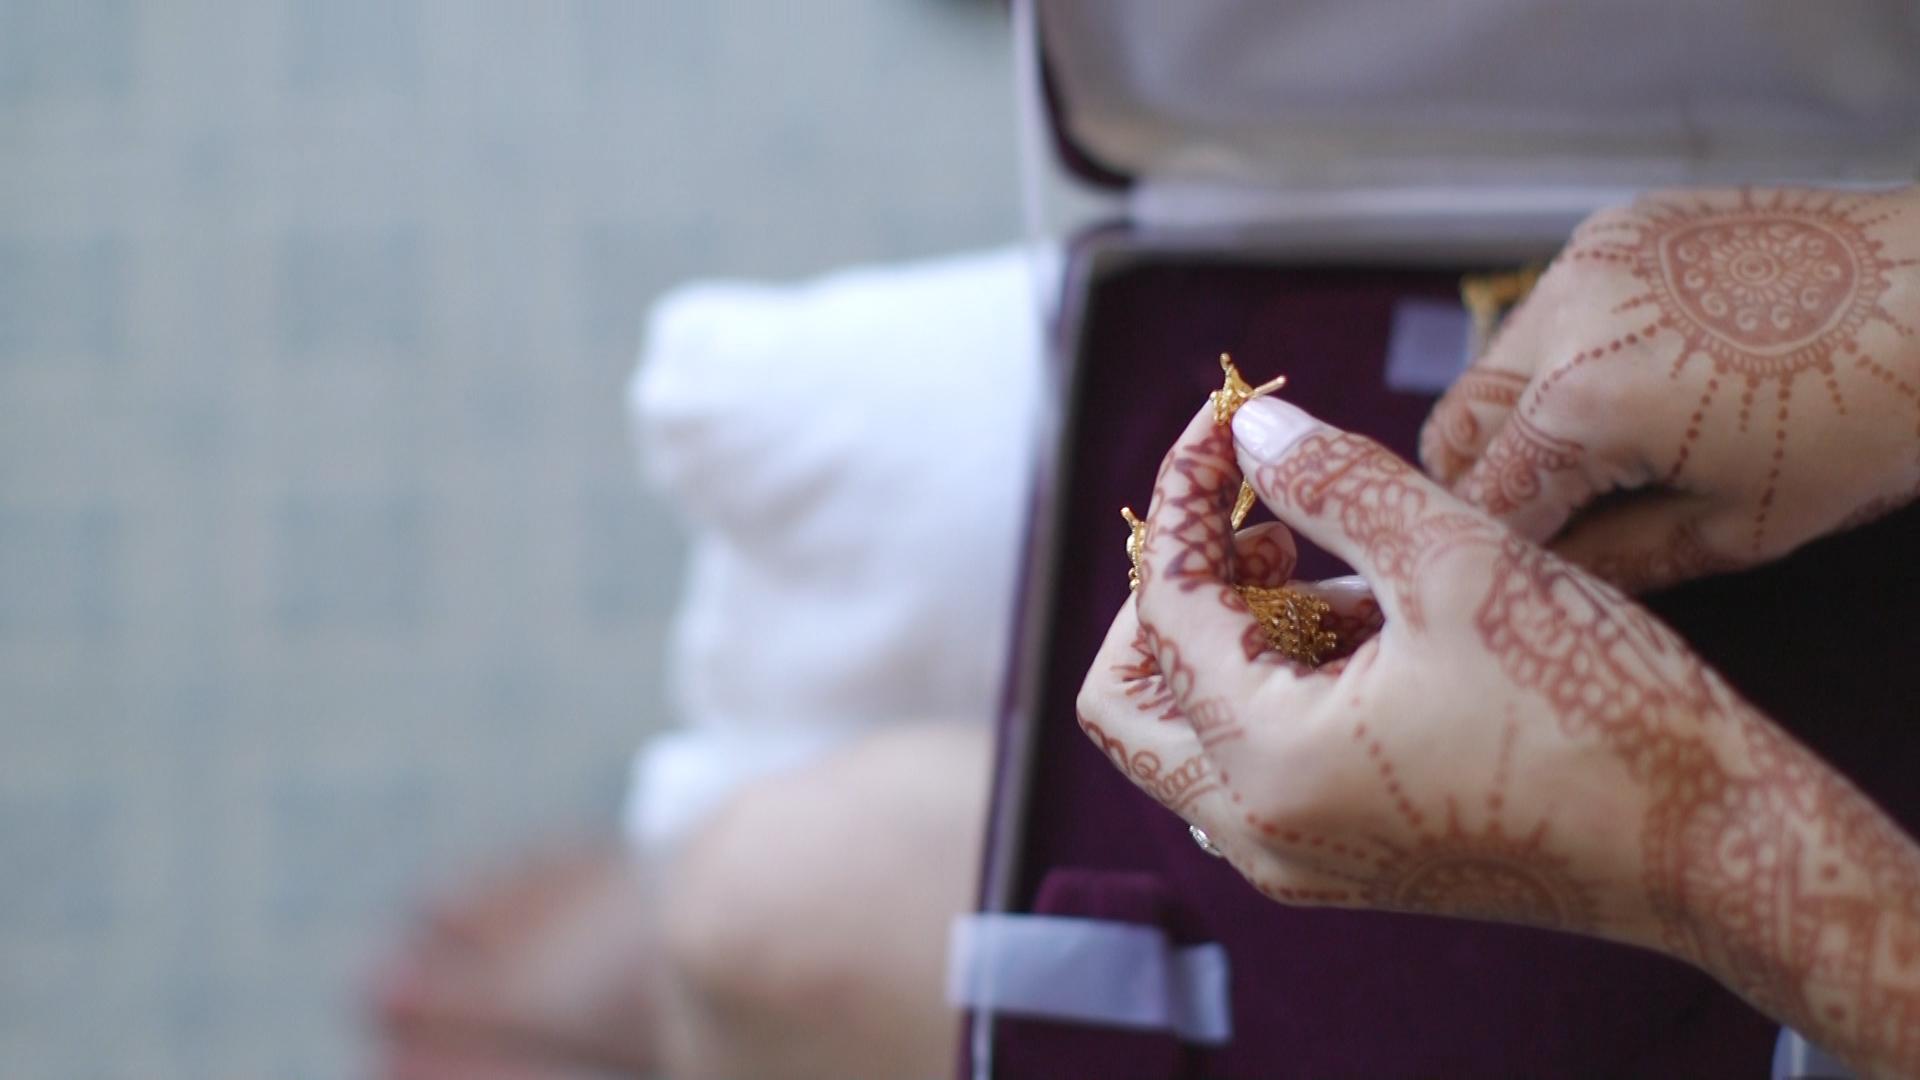 bride-hands-indian-wedding-jewlery.jpg